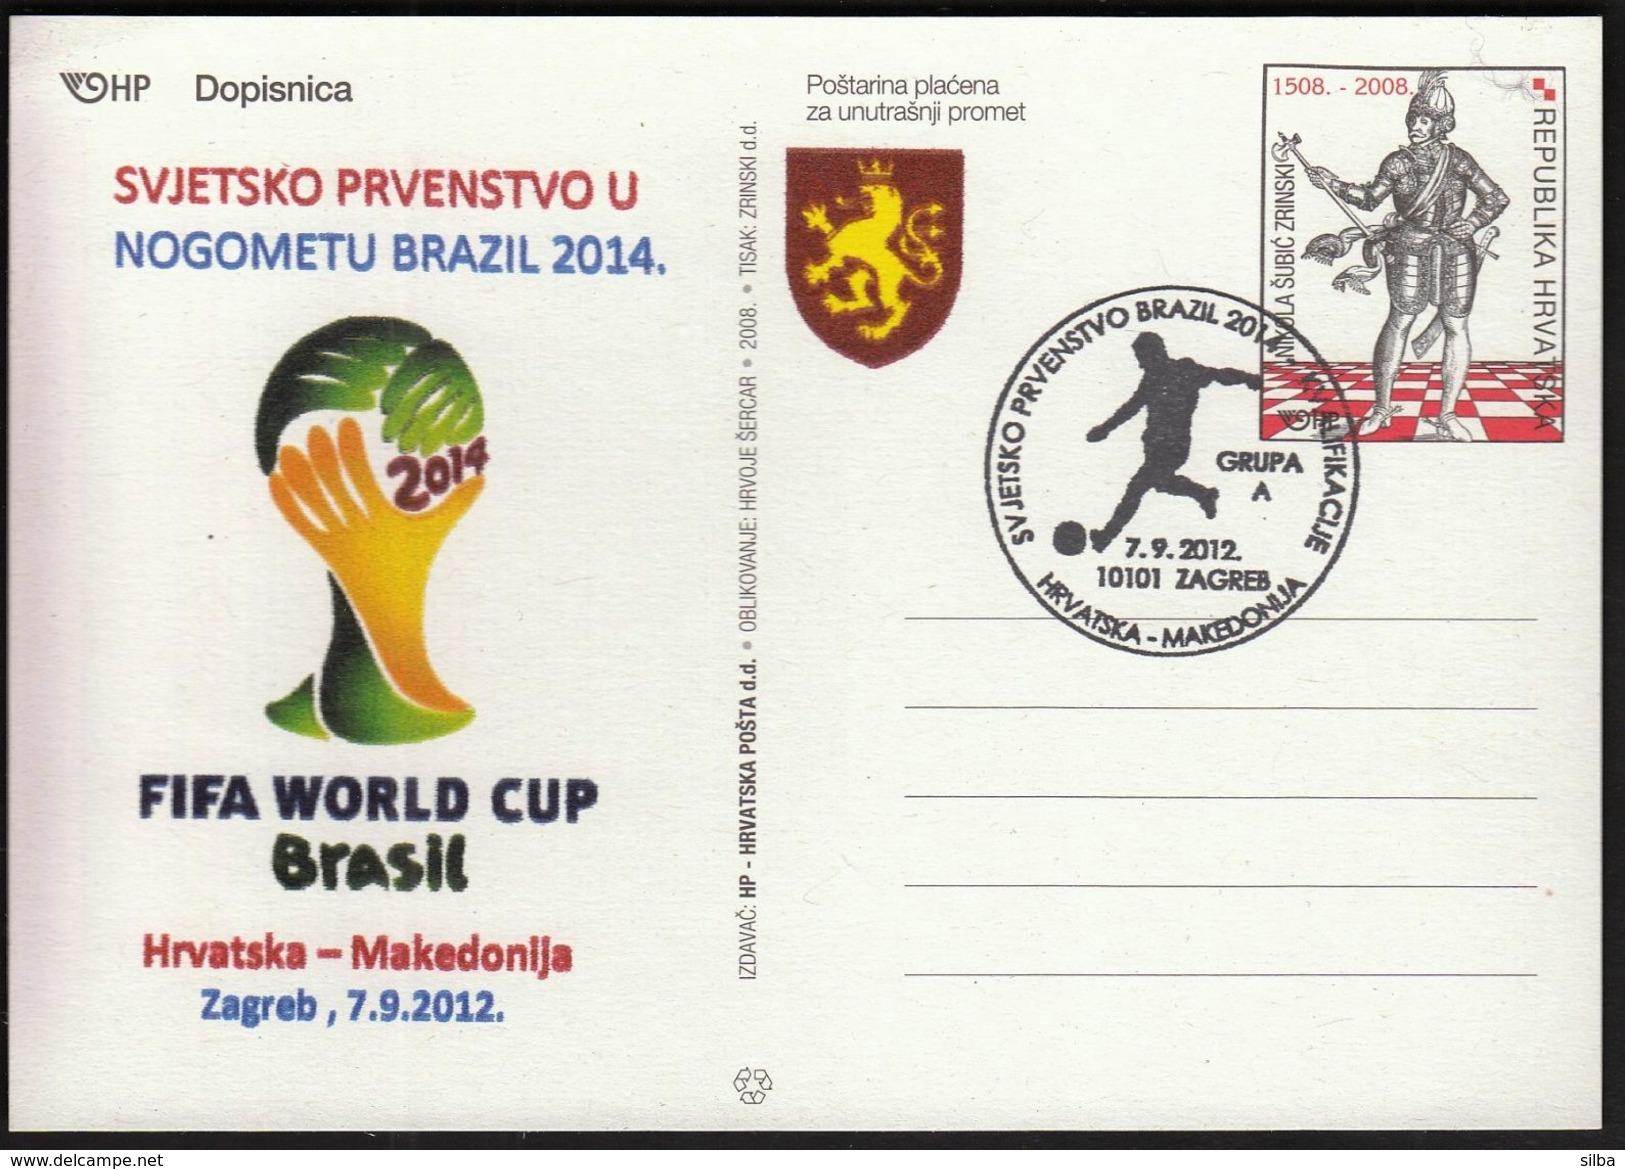 Croatia Zagreb 2012 / Soccer Football / World Championship Brazil 2014 / Qualifying Round Group A / Croatia - Macedonia - Wereldkampioenschap